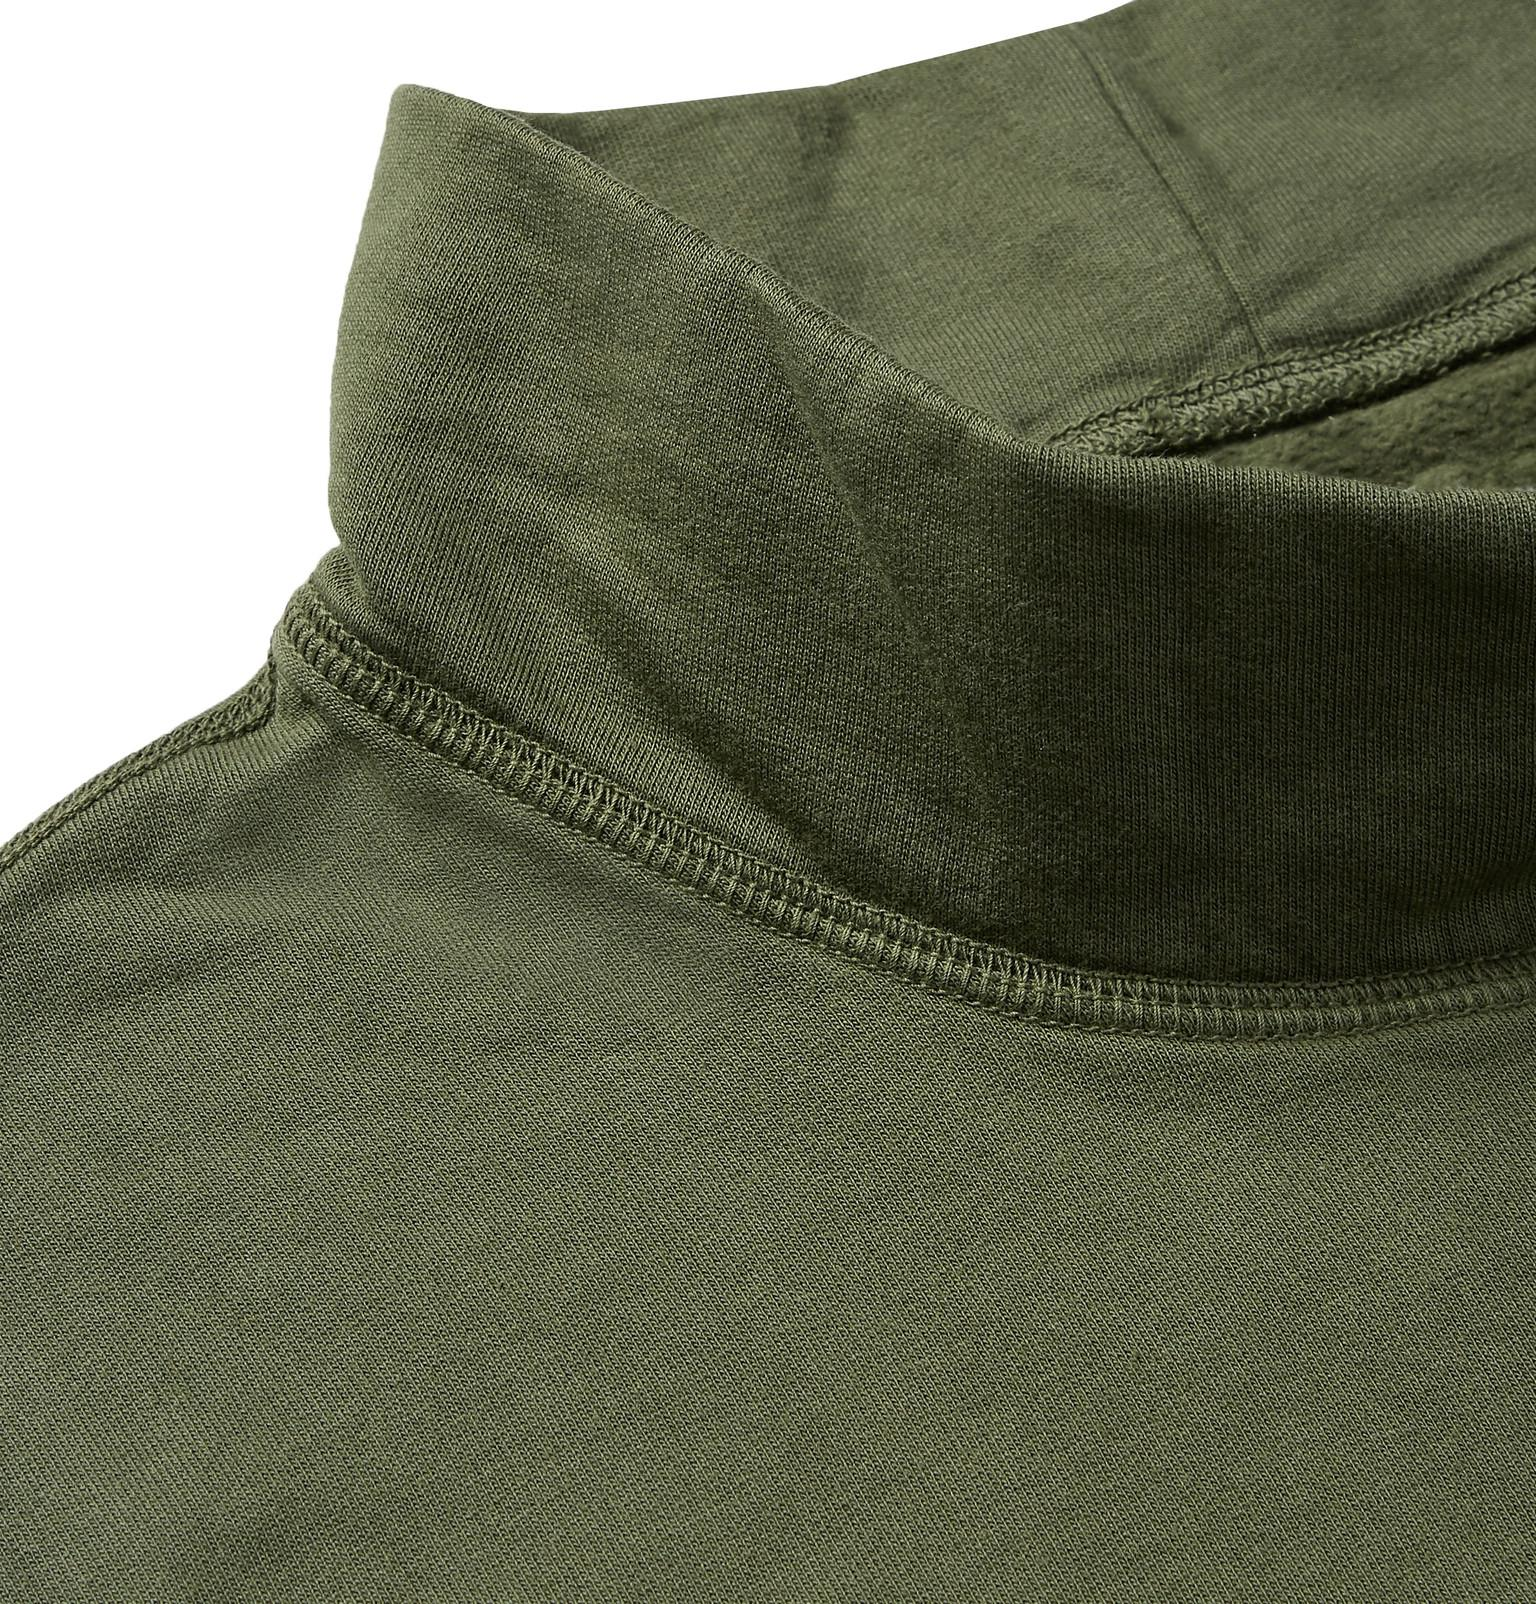 Save Green Back Cotton View Neck Fullscreen Sweatshirt Jersey Fleece Khaki Mock United Supima FfxrFTw